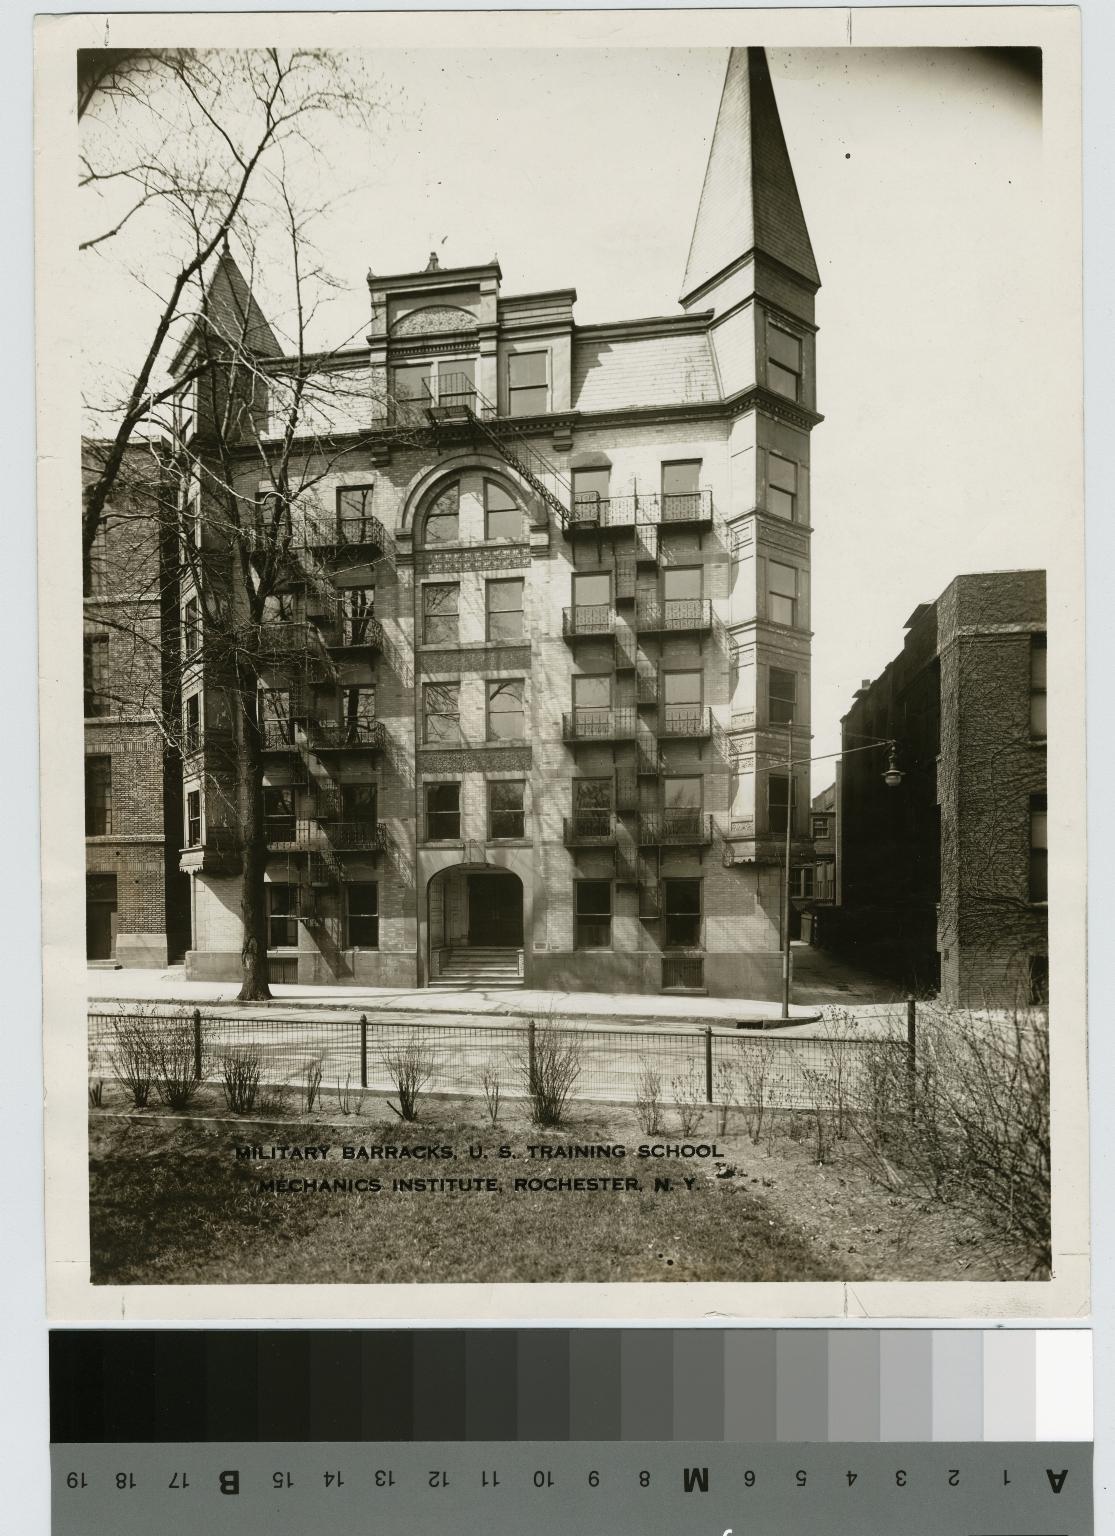 Military Barracks, Rochester Athenaeum and Mechanics Institute